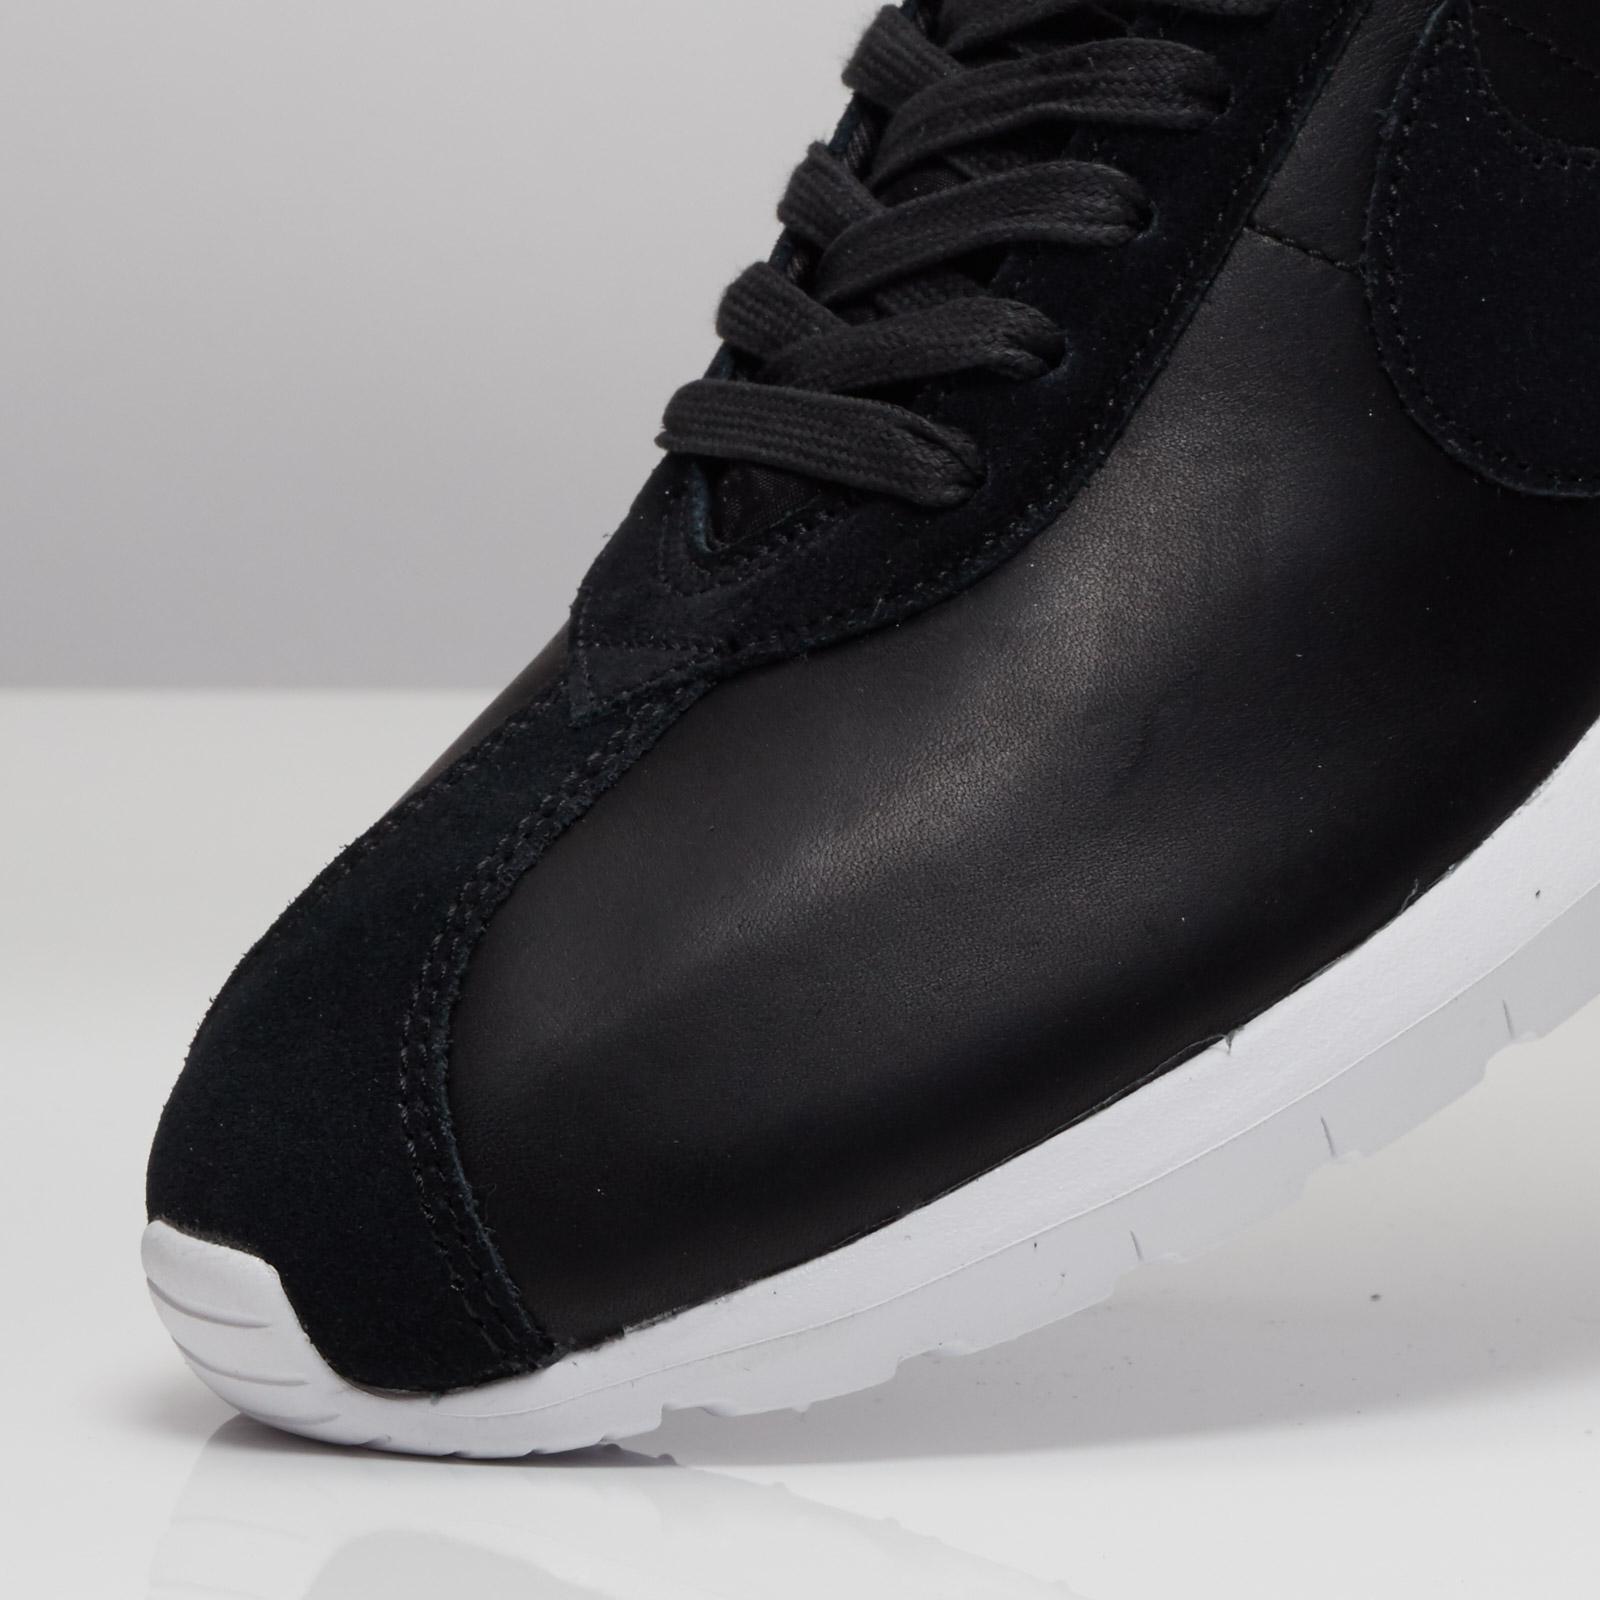 brand new 3b973 b233e Nike Roshe LD-1000 Premium QS - 842564-001 - Sneakersnstuff   sneakers    streetwear online since 1999